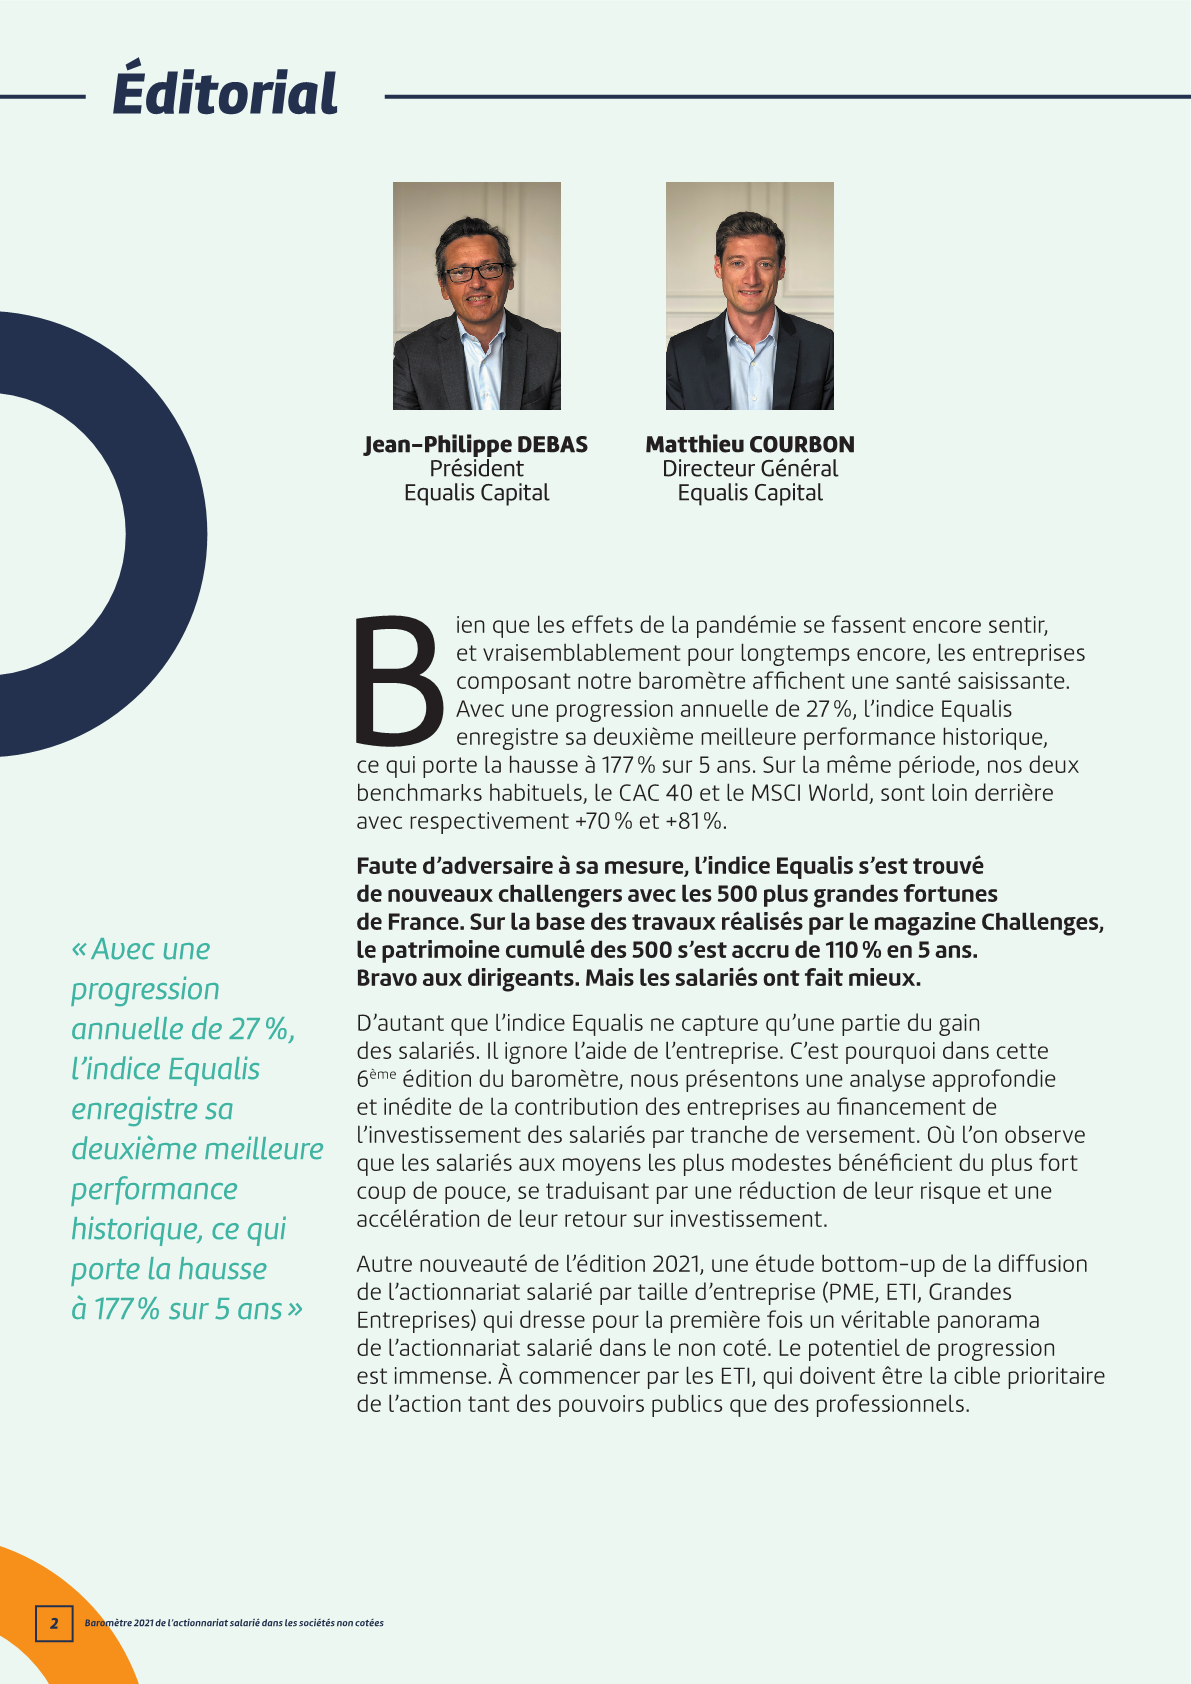 Baromètre_Equalis_Rapport_2021_web2